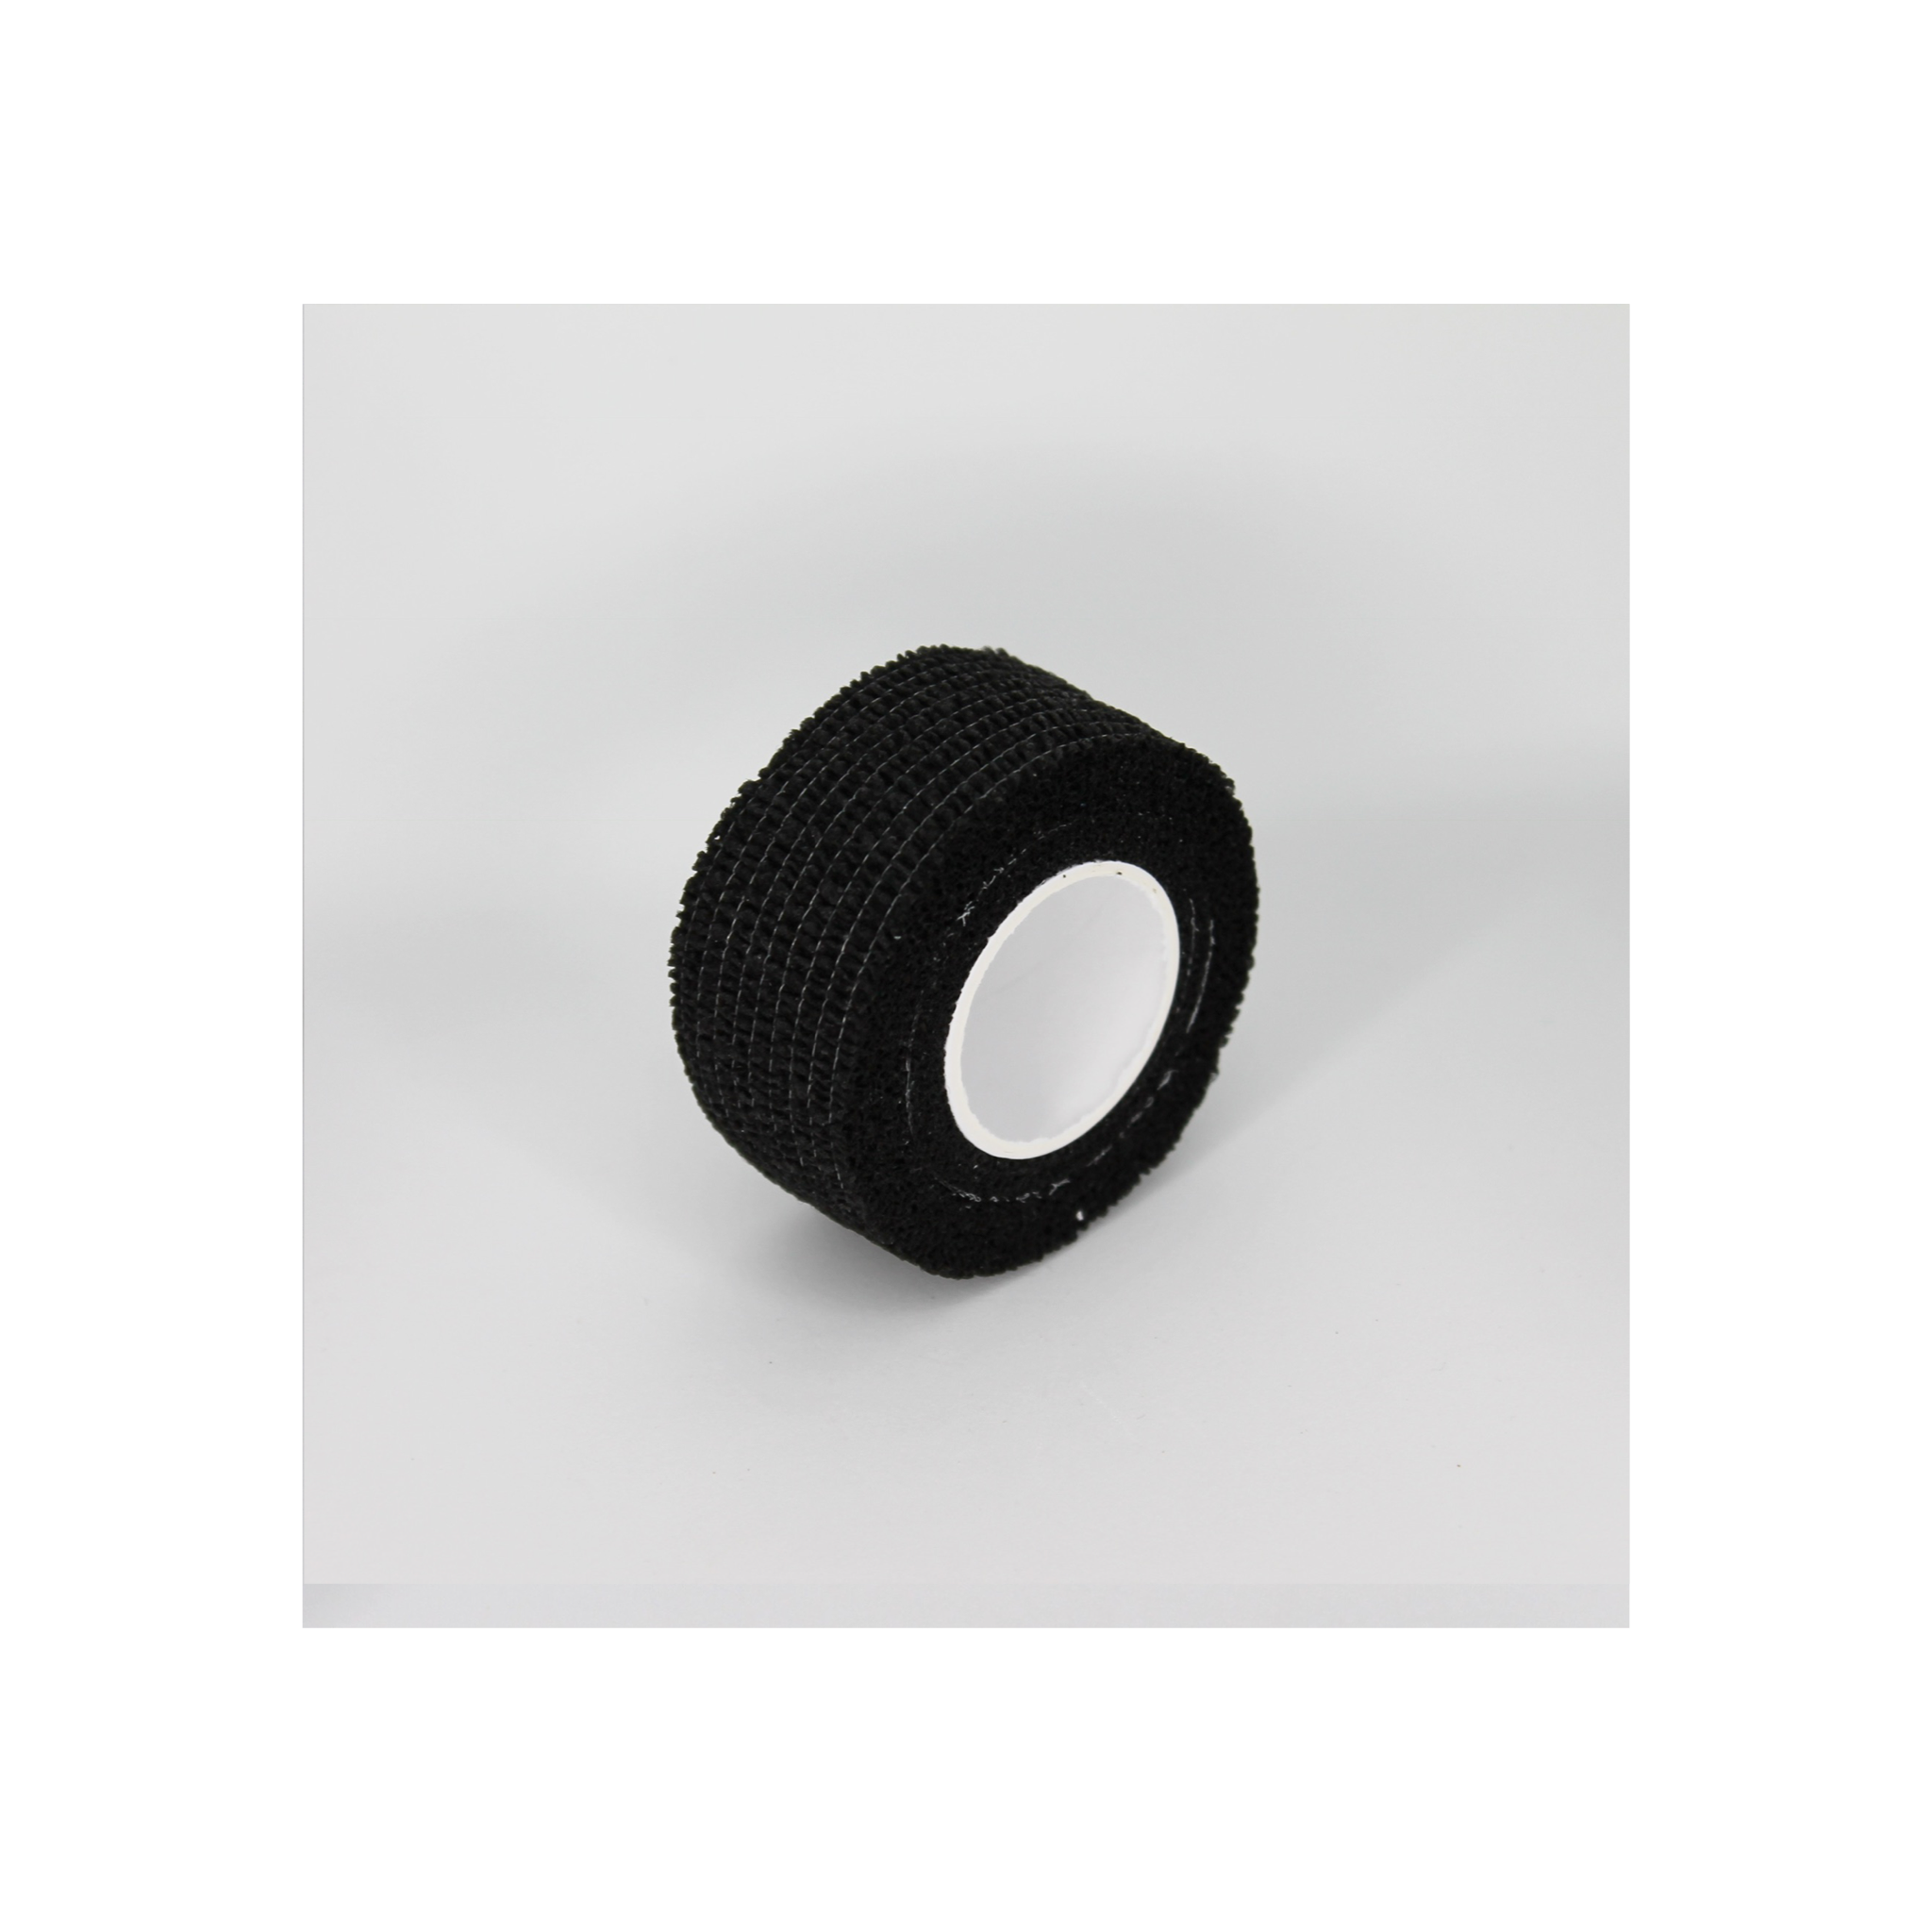 Grip Wrap Tape, Black